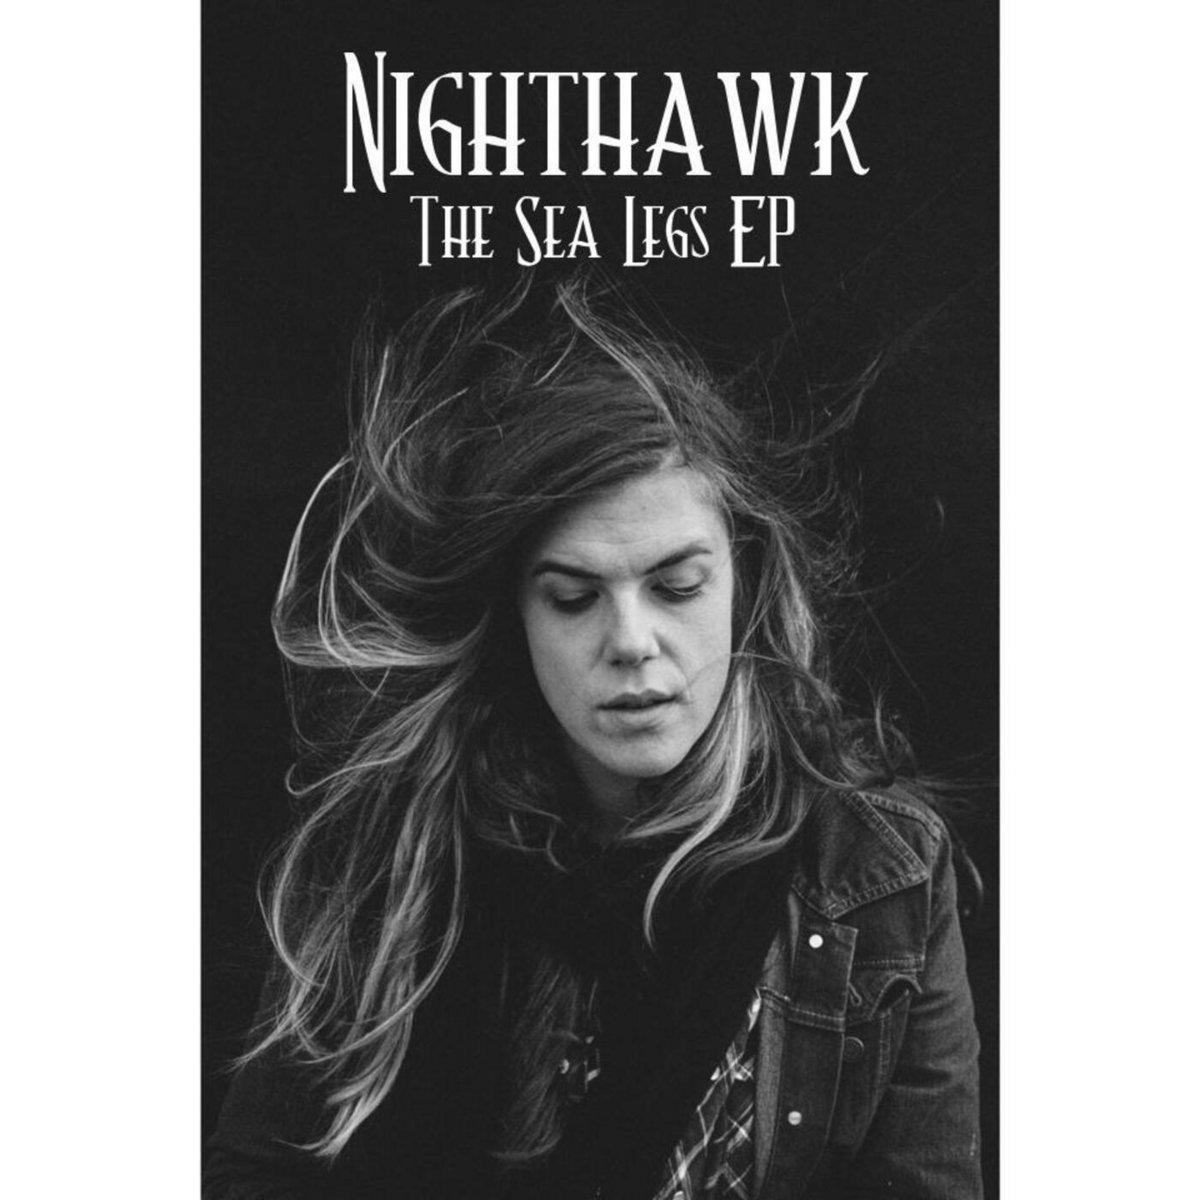 Nighthawk The Sea Legs EP